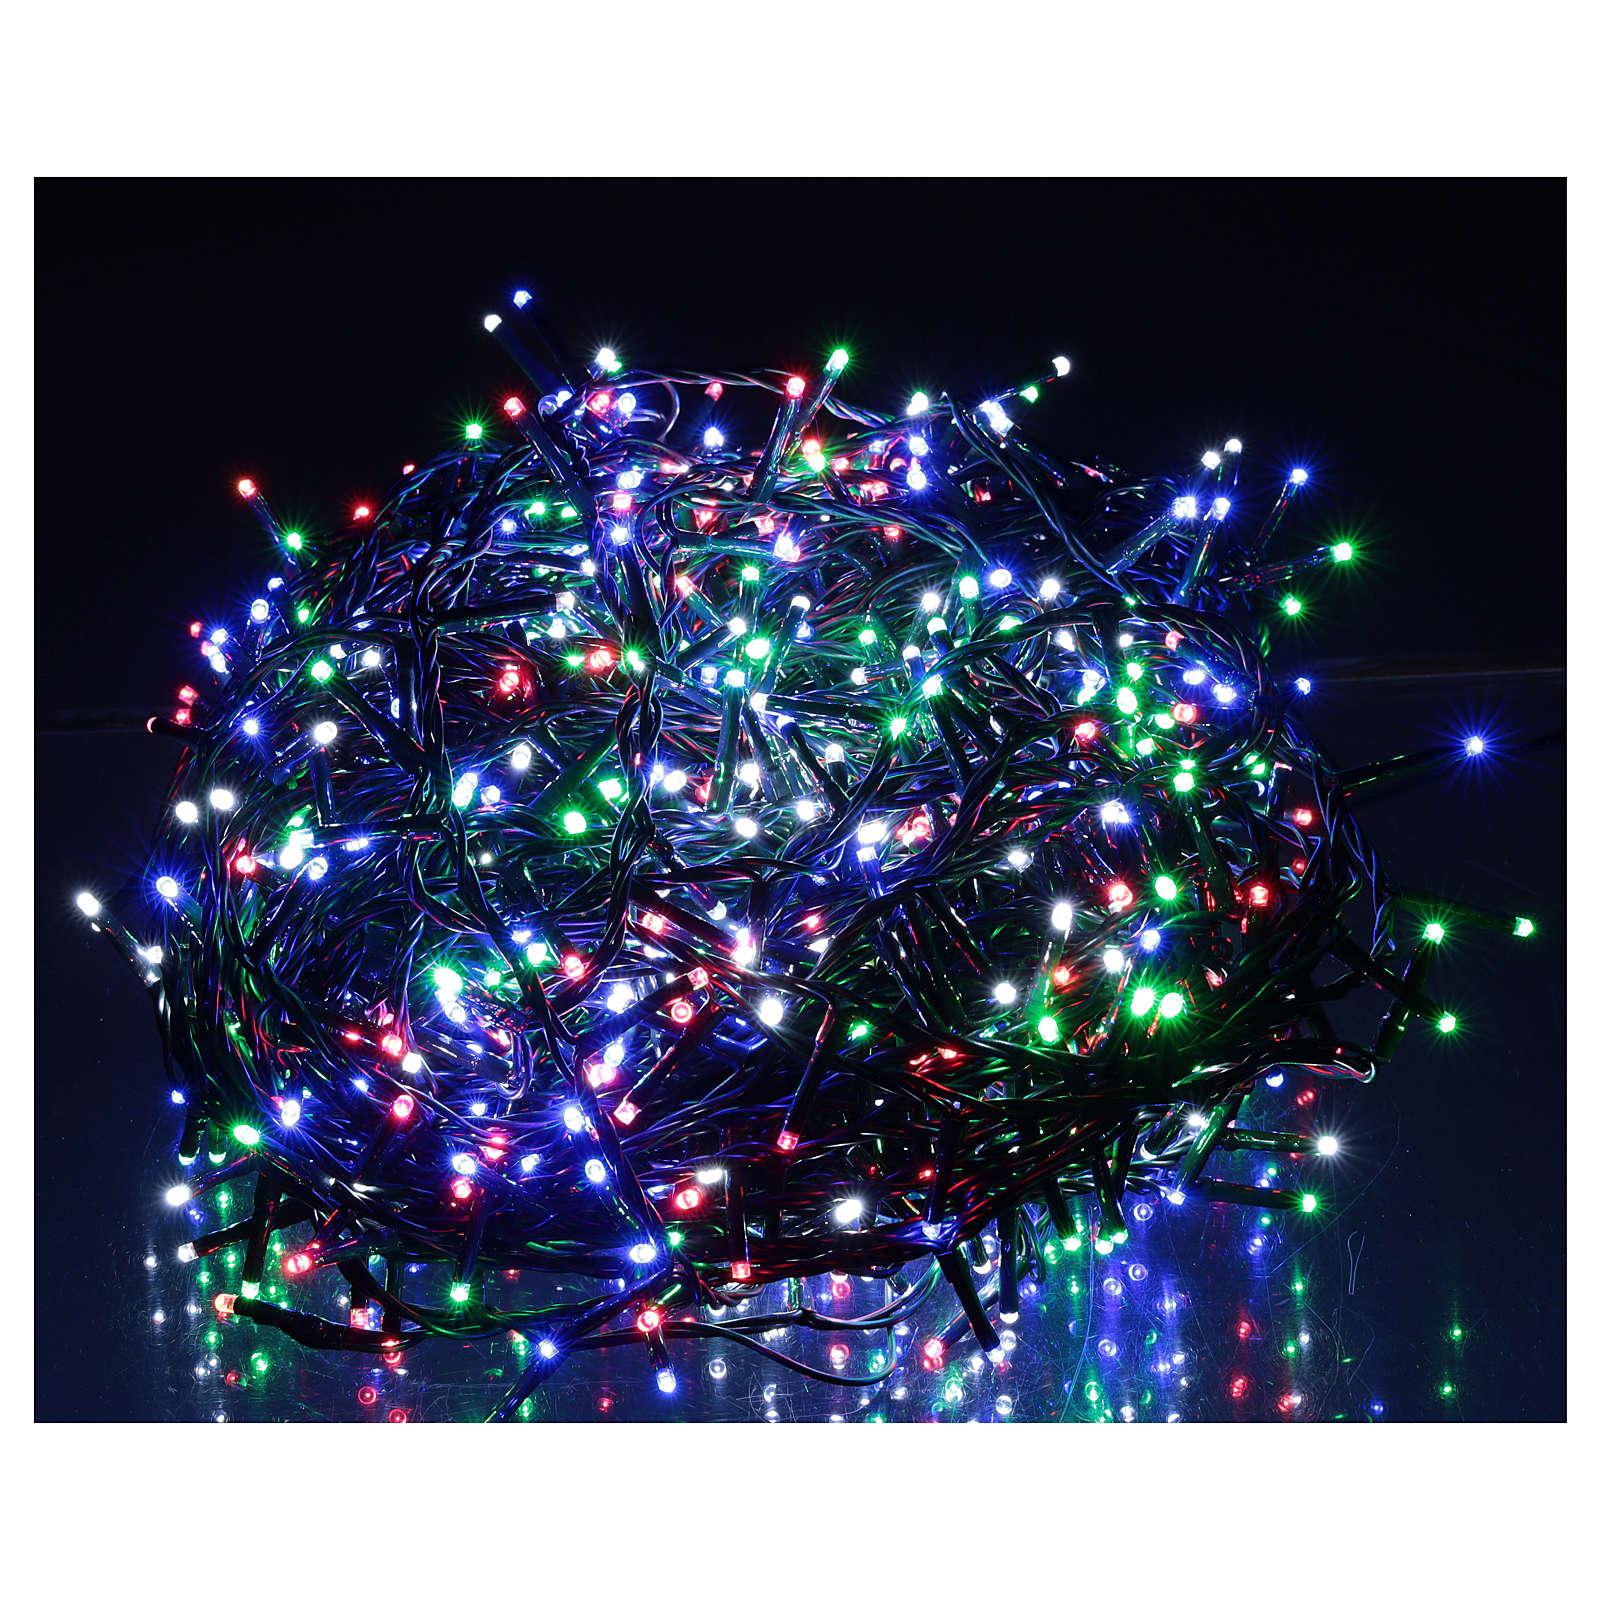 Cadena luminosa Navidad verde 1000 led multicolor control remoto exterior 220V 3